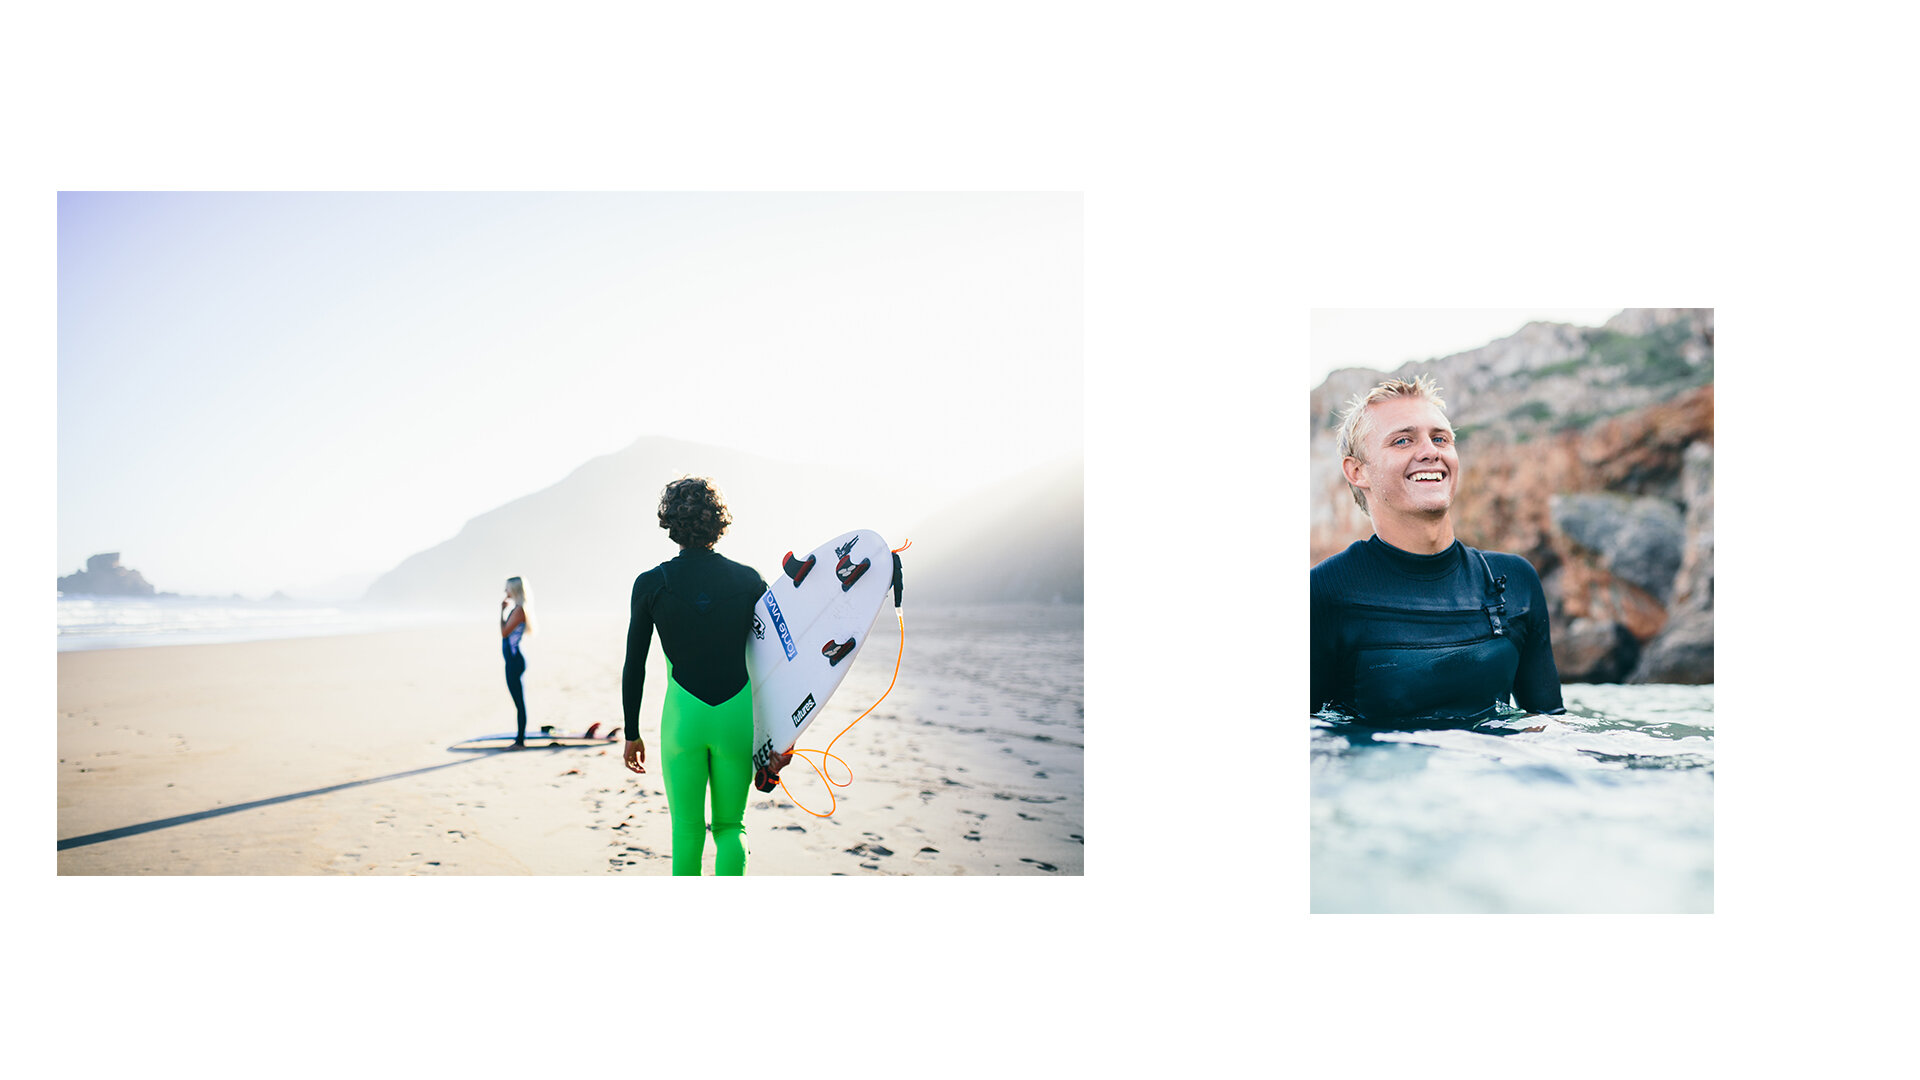 toby-butler-tobybutlerphoto-surf-surfing-waterphotography-ocean-Oneill-wetsuits-swimwear-girl-bikini-clothing-surf-portugal-lifestylephotography-2.jpg